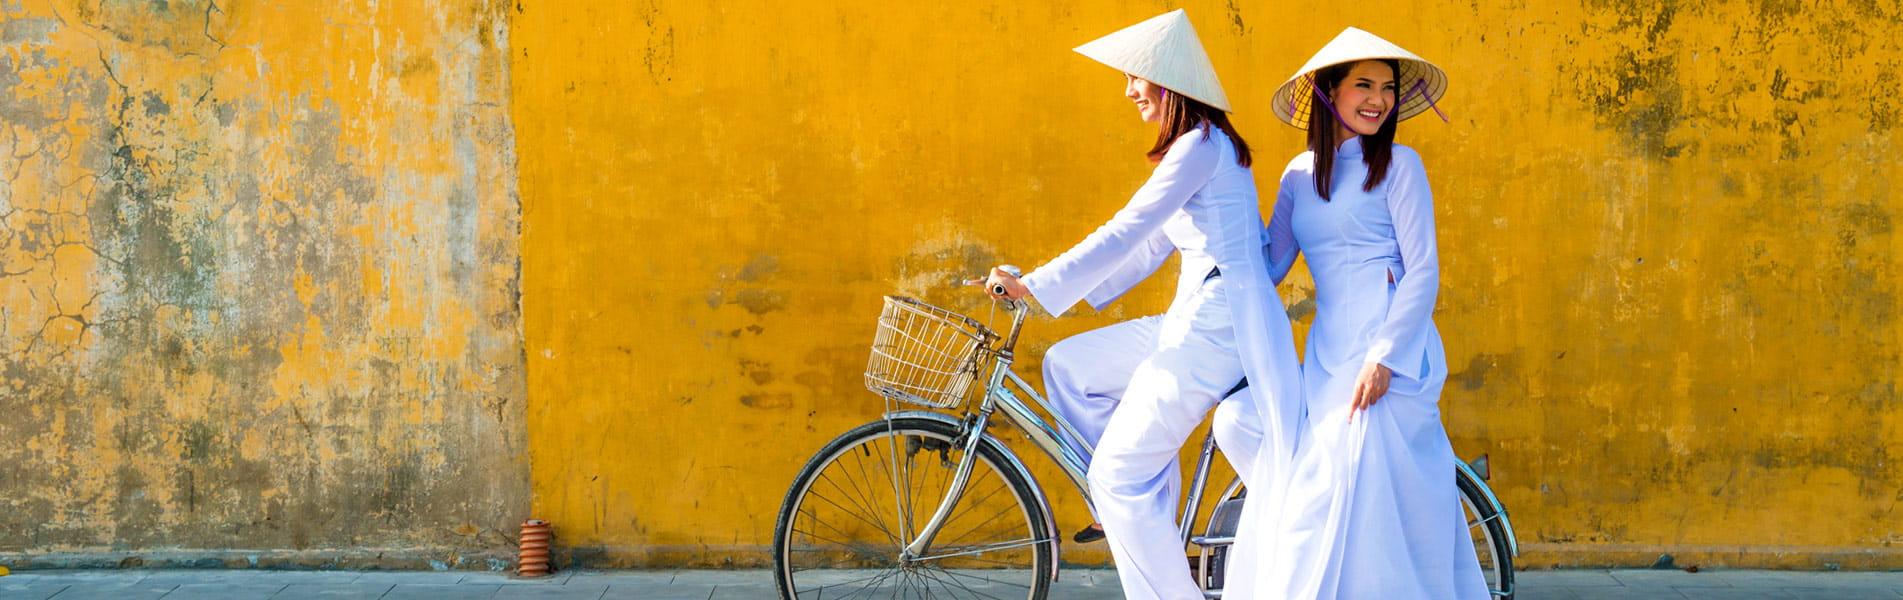 Vietnam women in traditional costumes